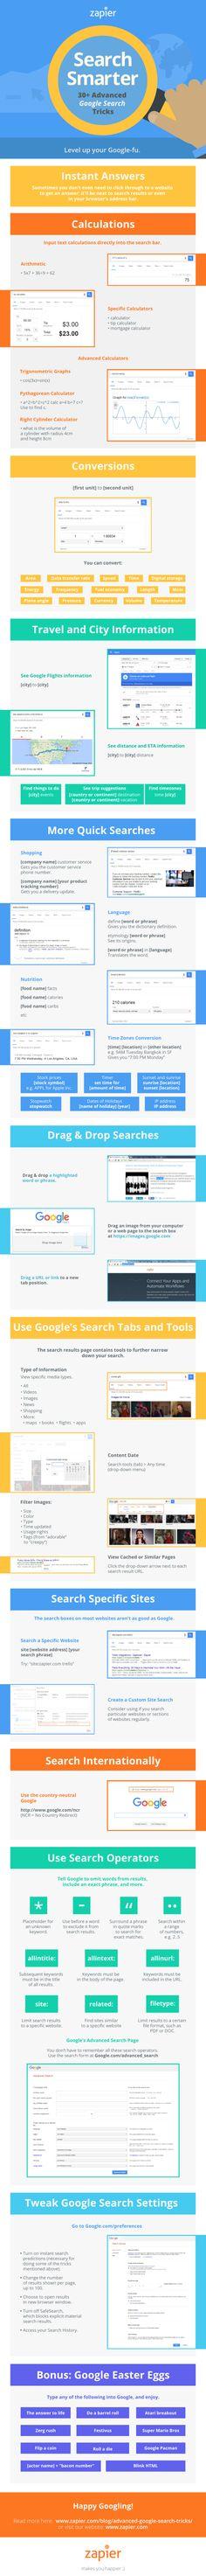 infographics-goog-search-tricks